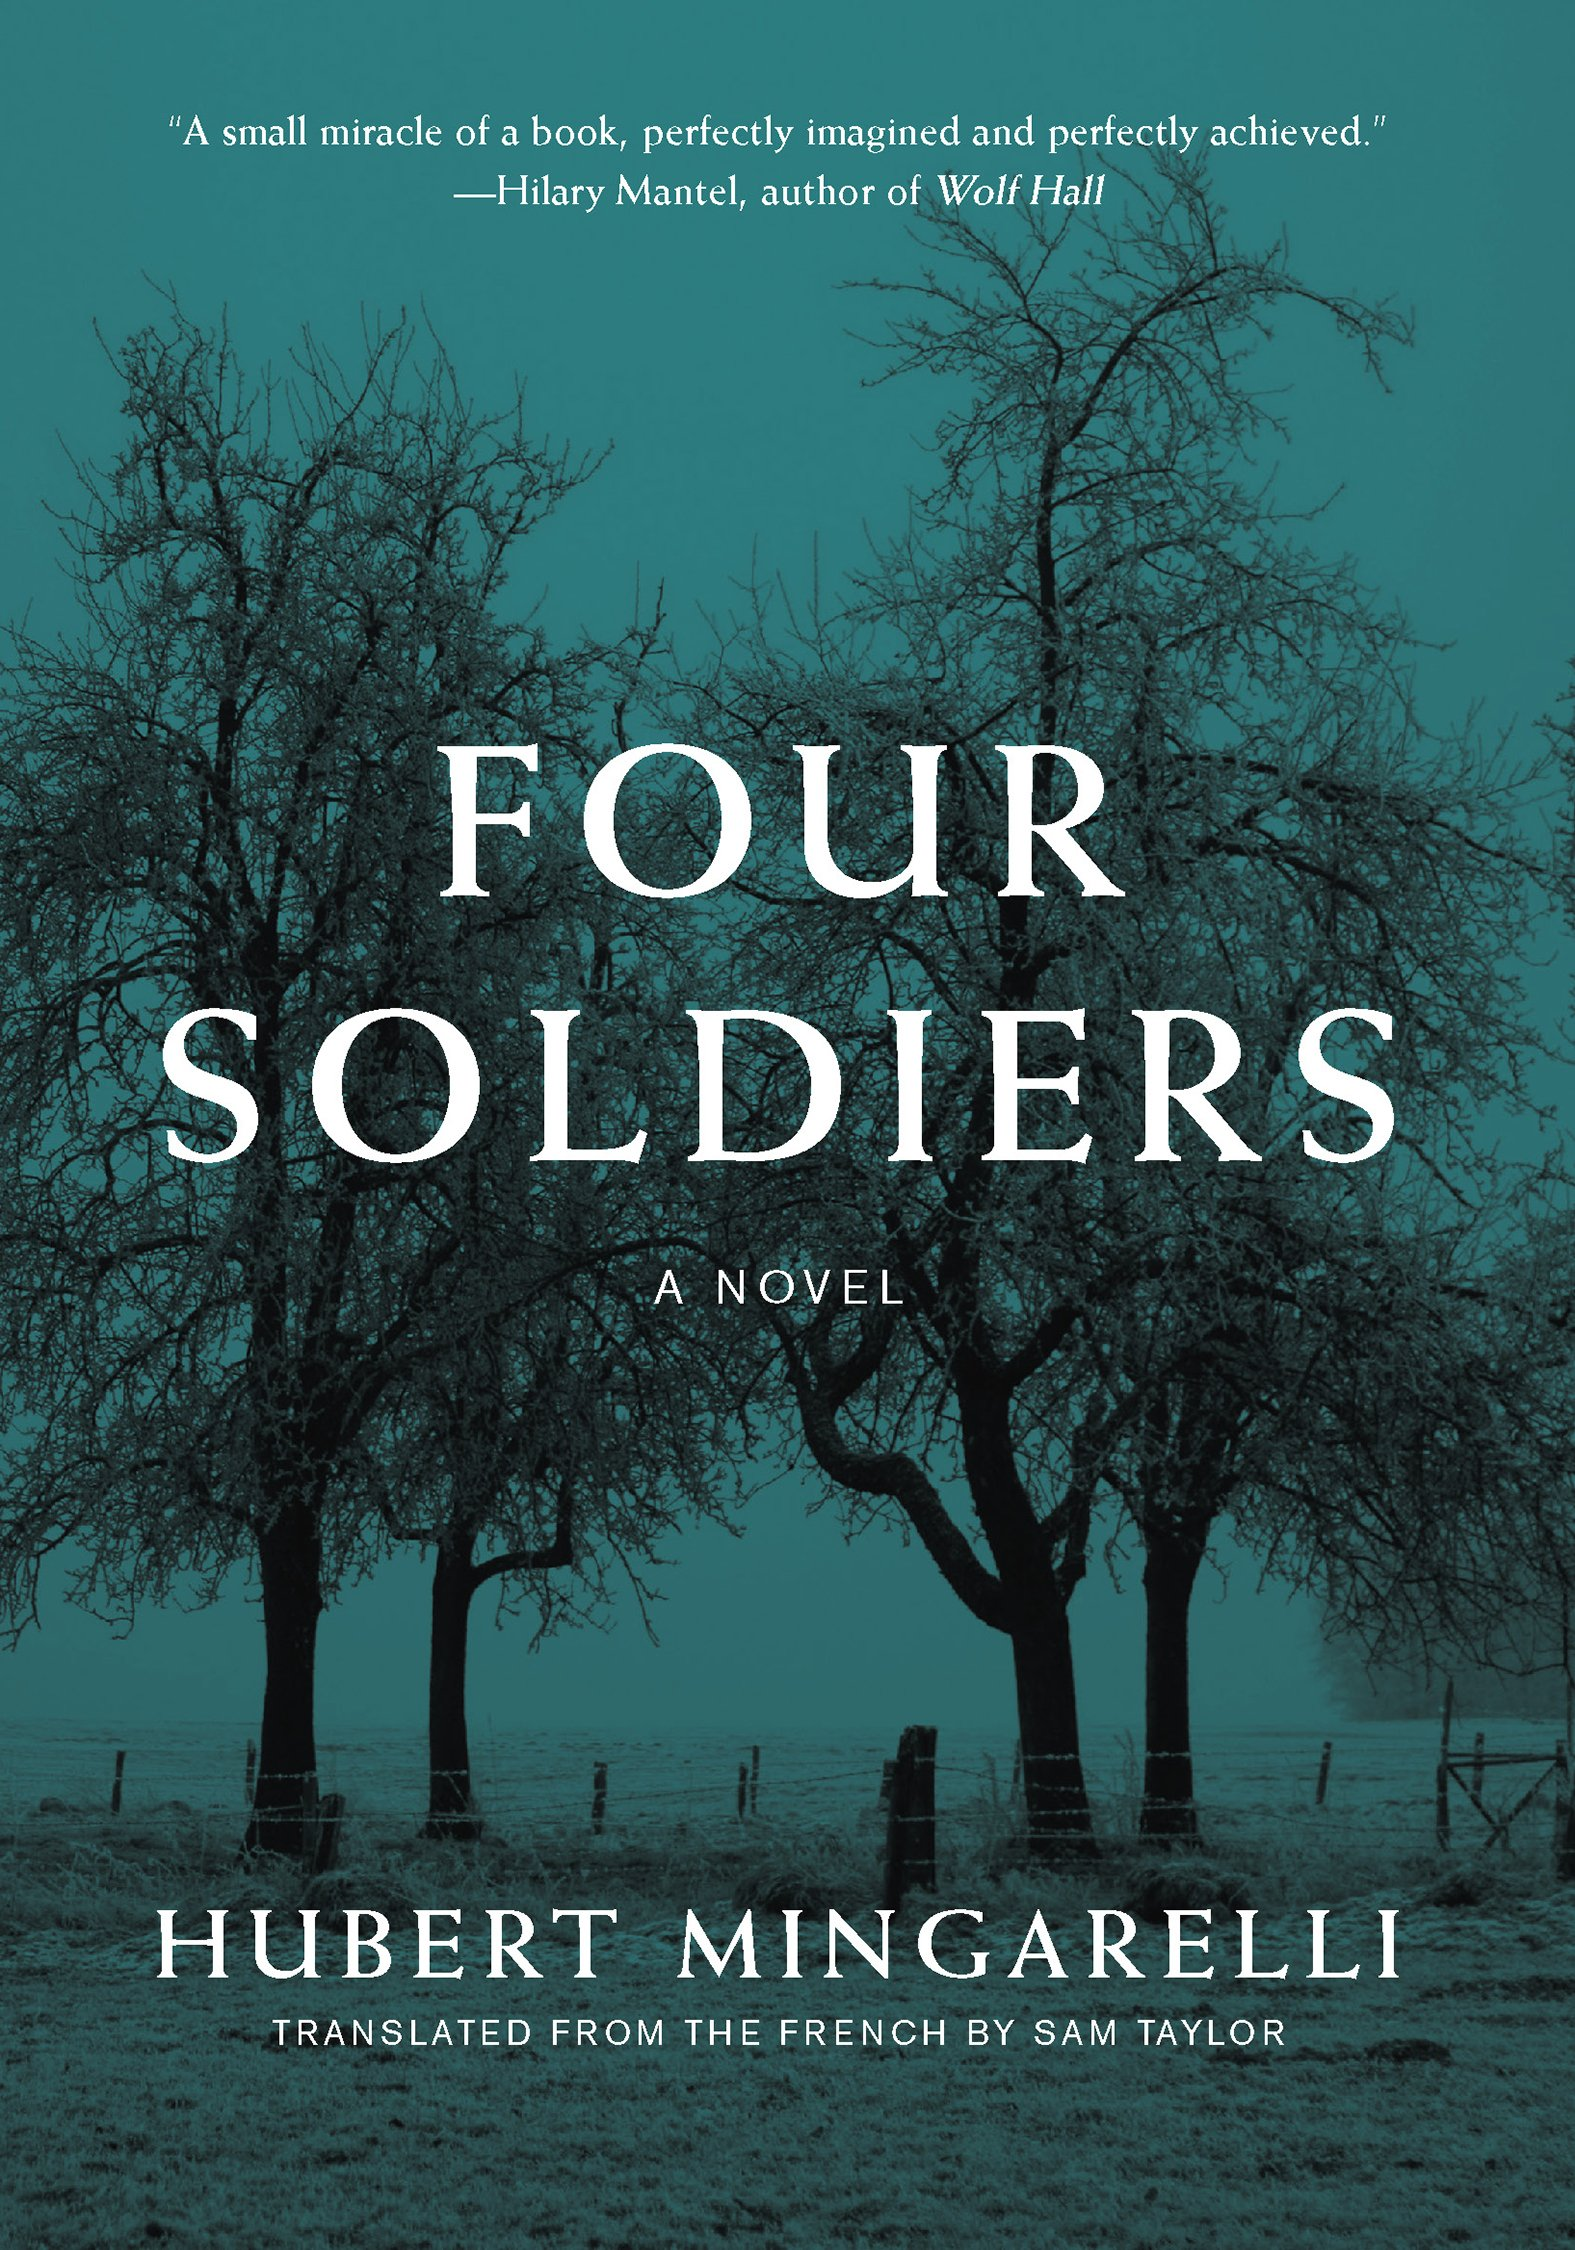 Four Soldiers: A Novel: Hubert Mingarelli, Sam Taylor: 9781620974407:  Amazon.com: Books